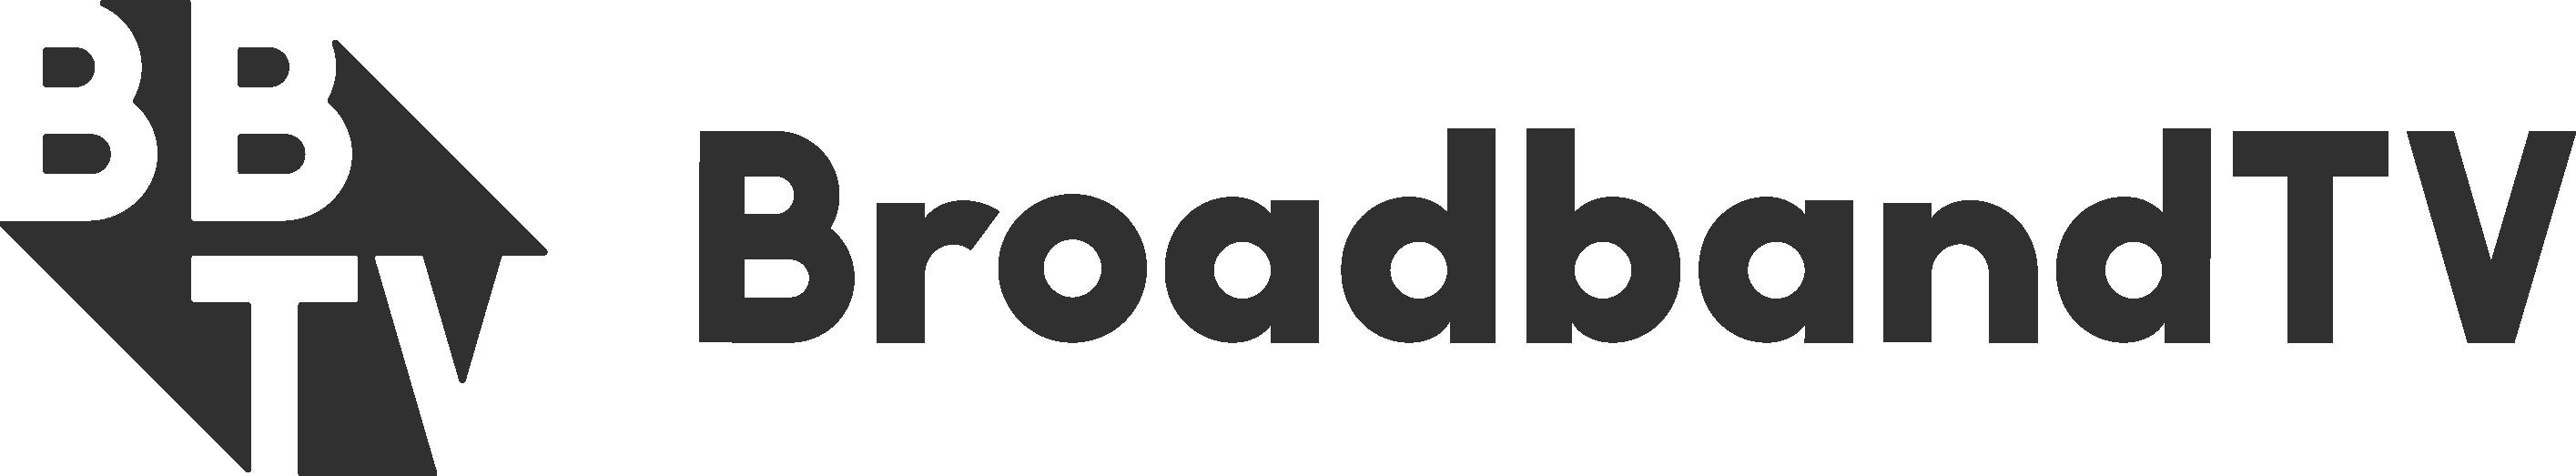 BBTV Horizontal Charcoal Logo